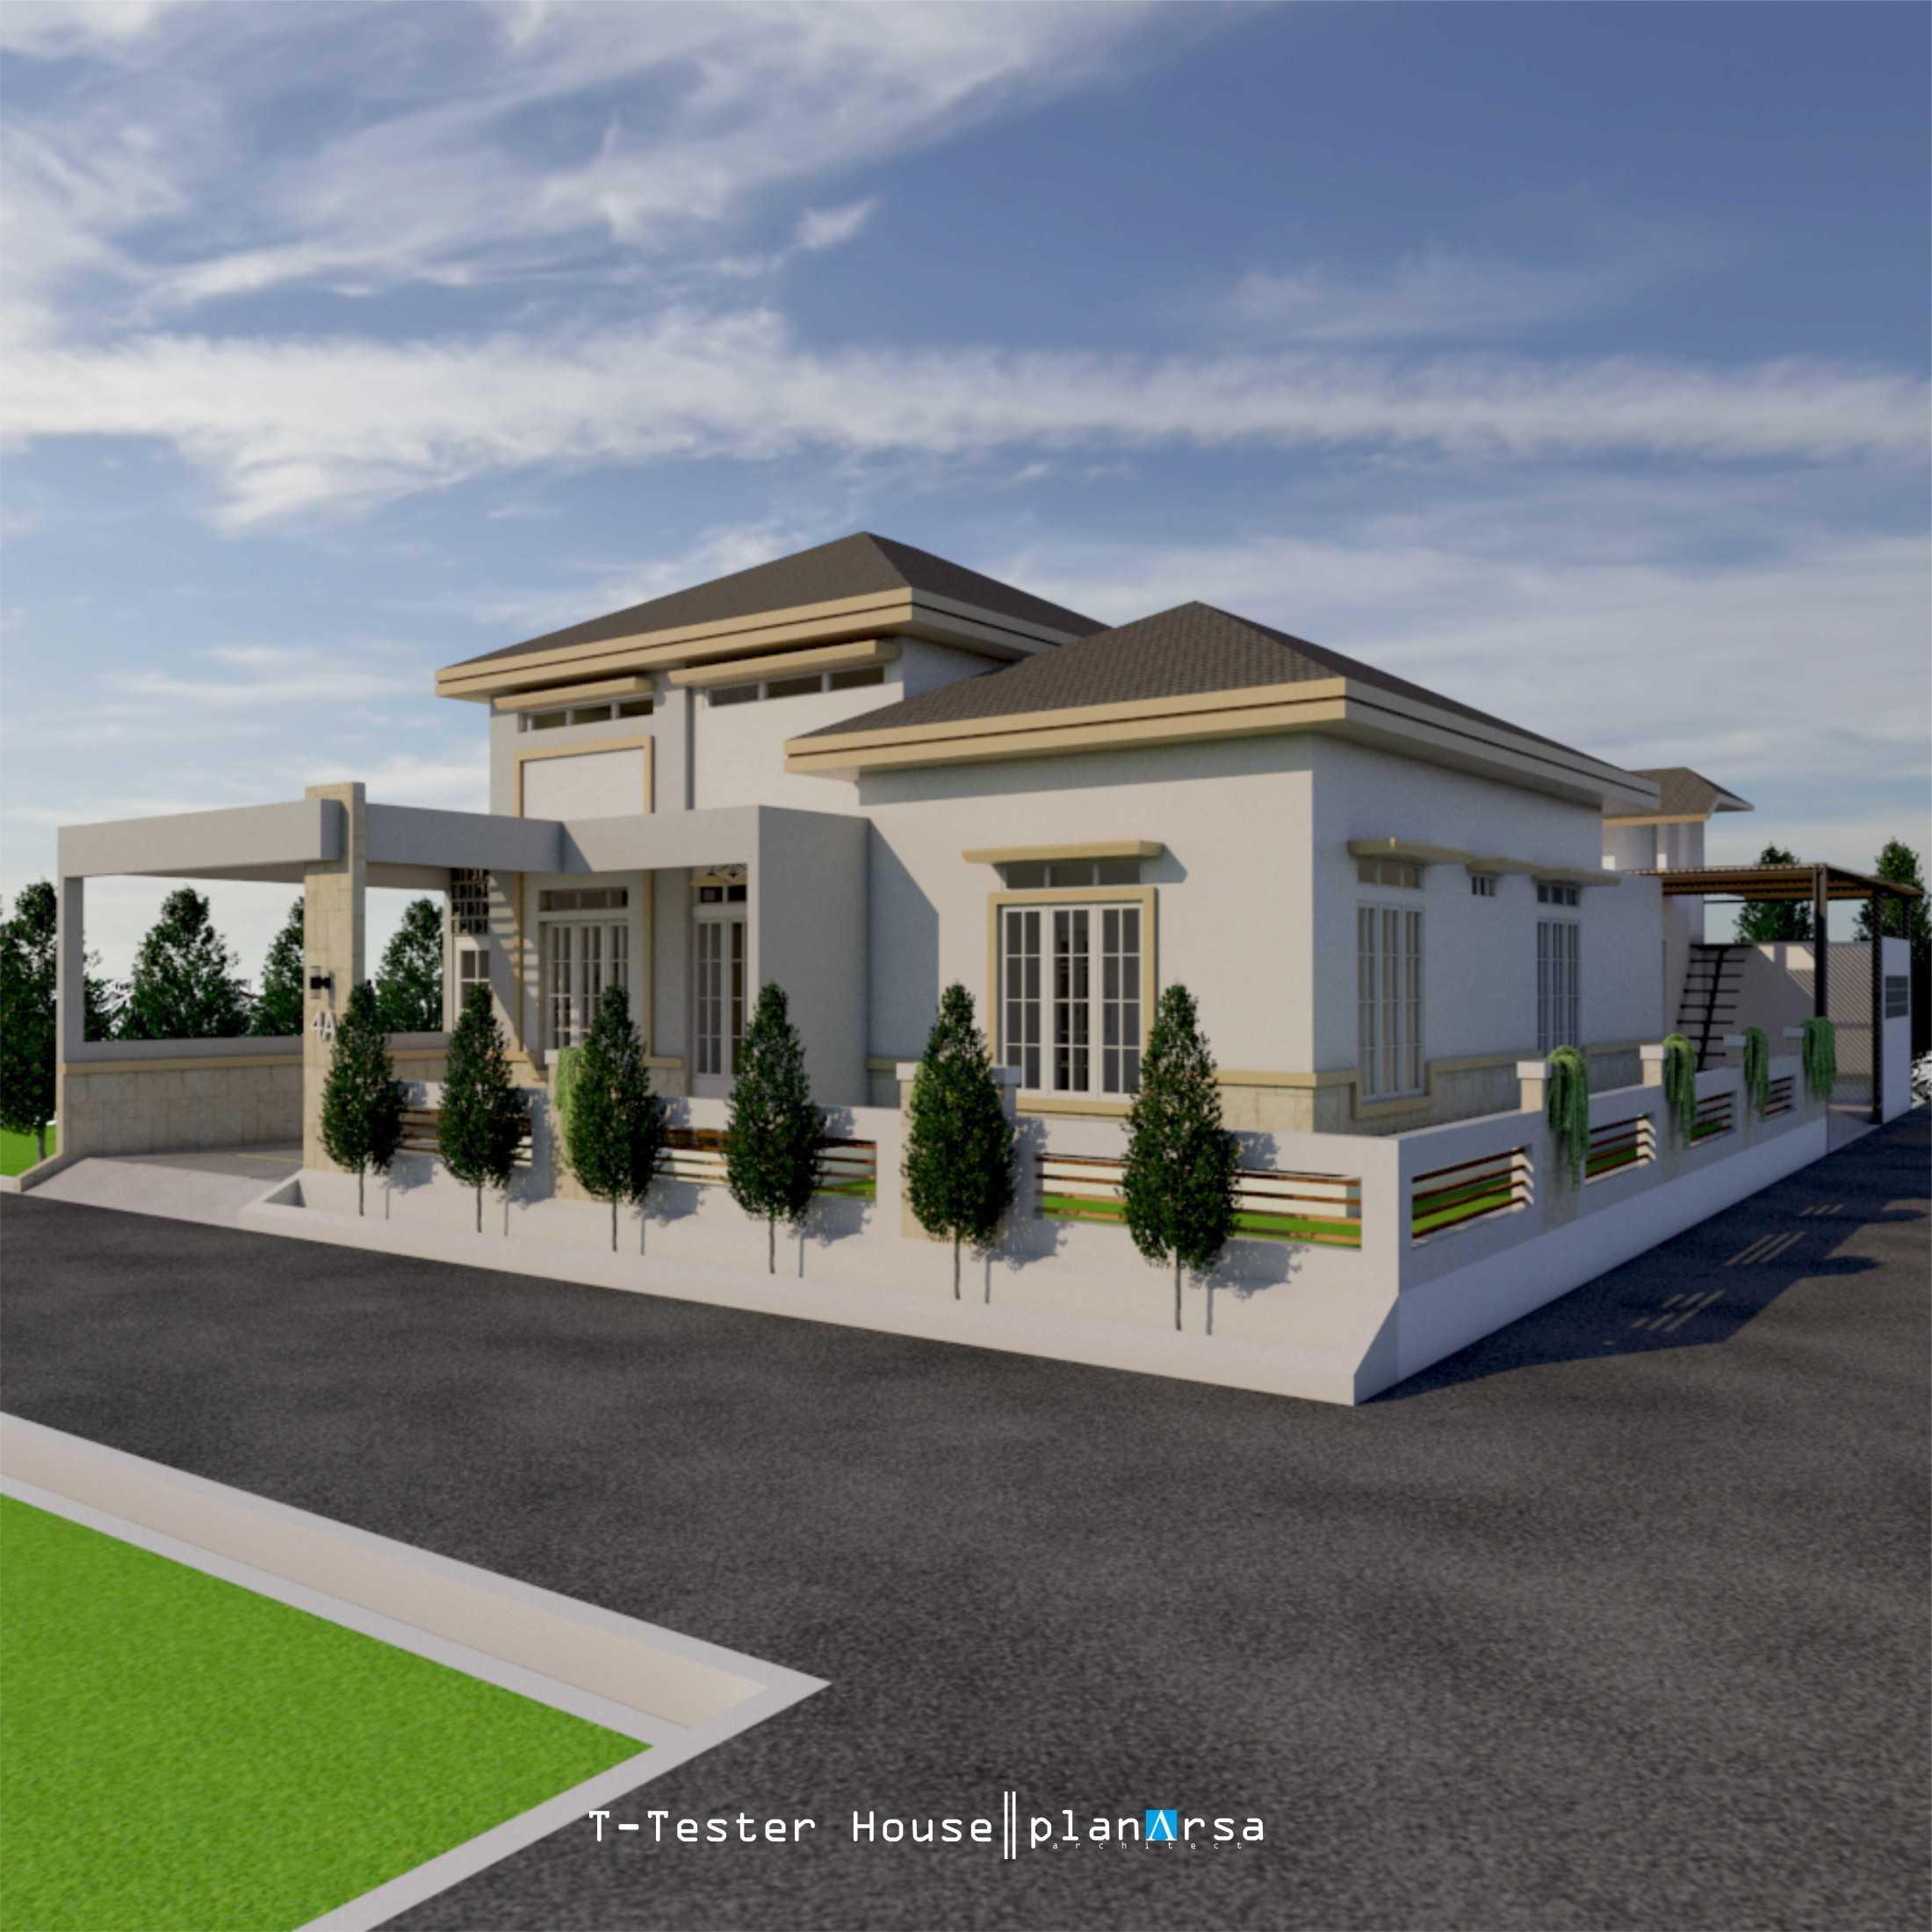 Planarsa Architect T-Tester House Aceh, Indonesia Aceh, Indonesia Planarsa-Architect-T-Tester-House  79252